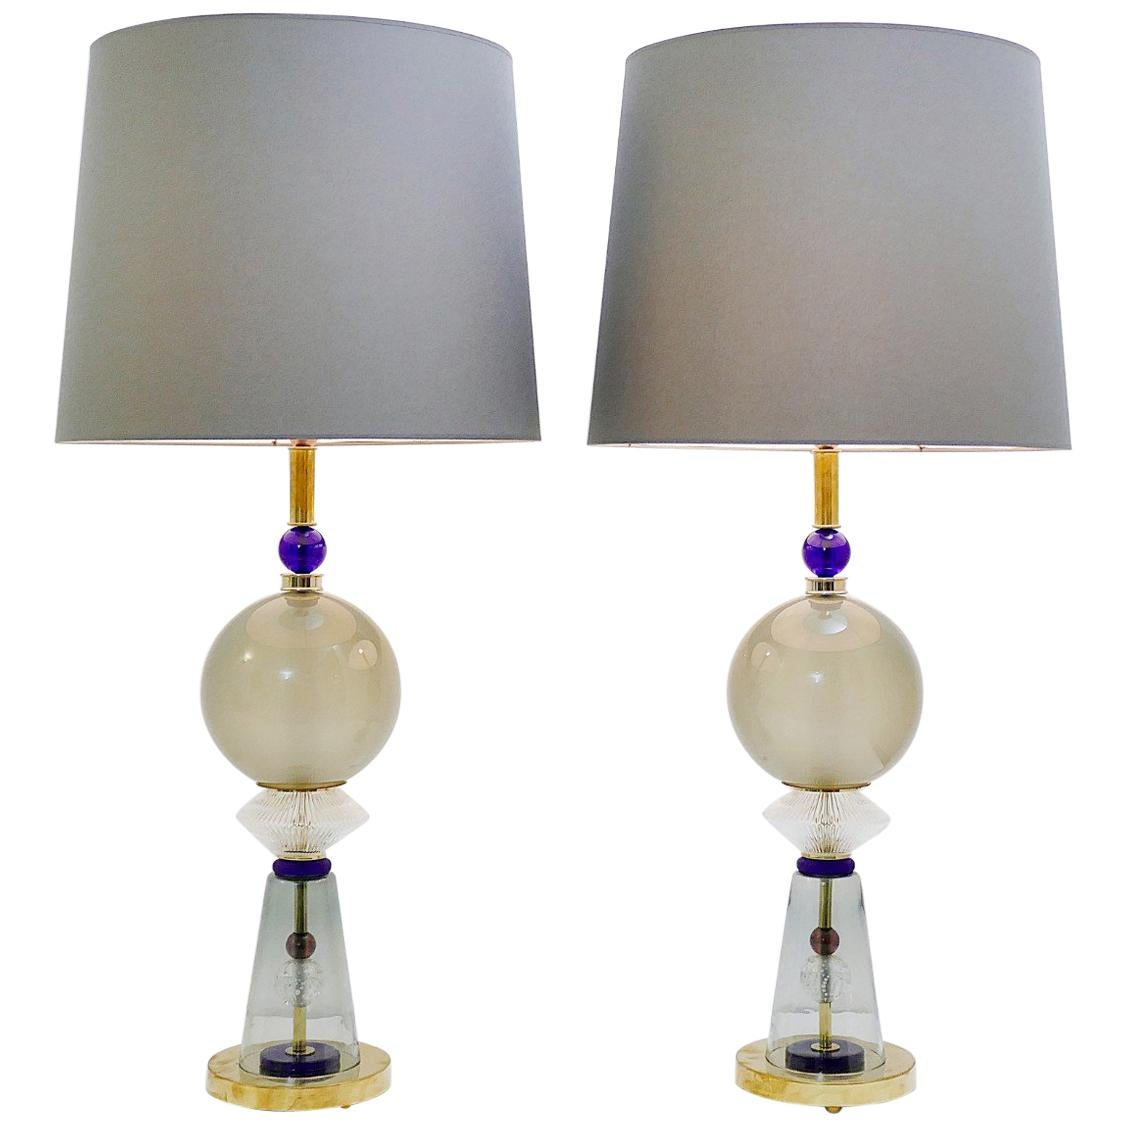 Pair of Italian Table Lamps in Murano Glass